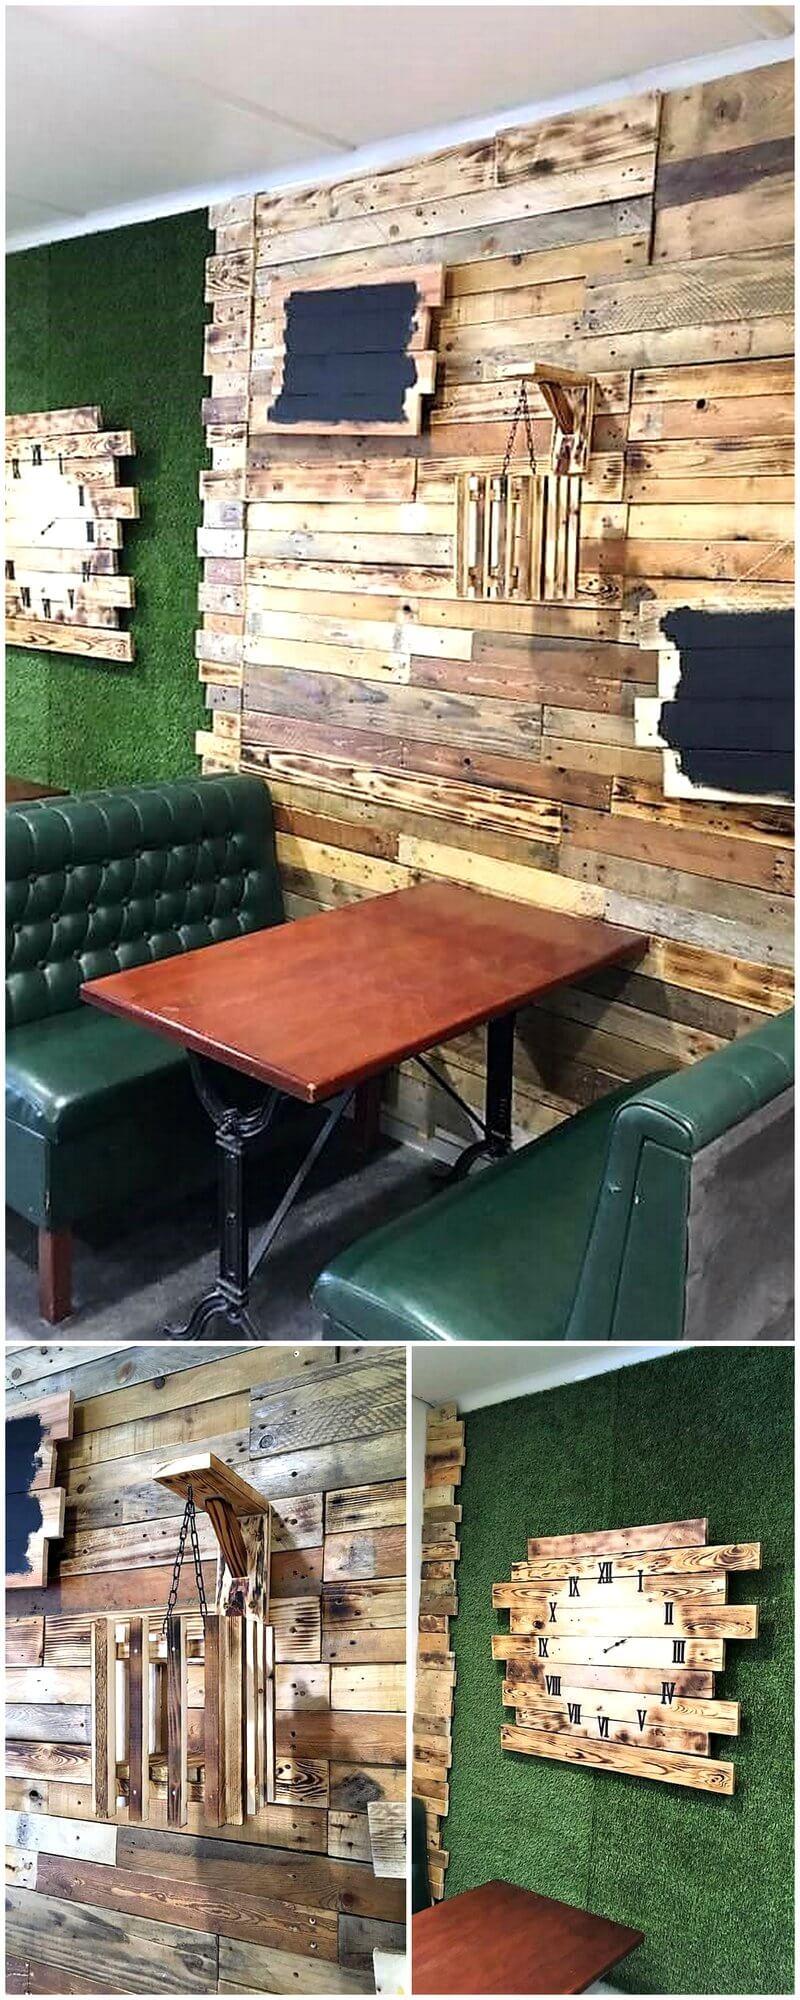 Reclaimed Wooden Pallet Wall Art in Cafe